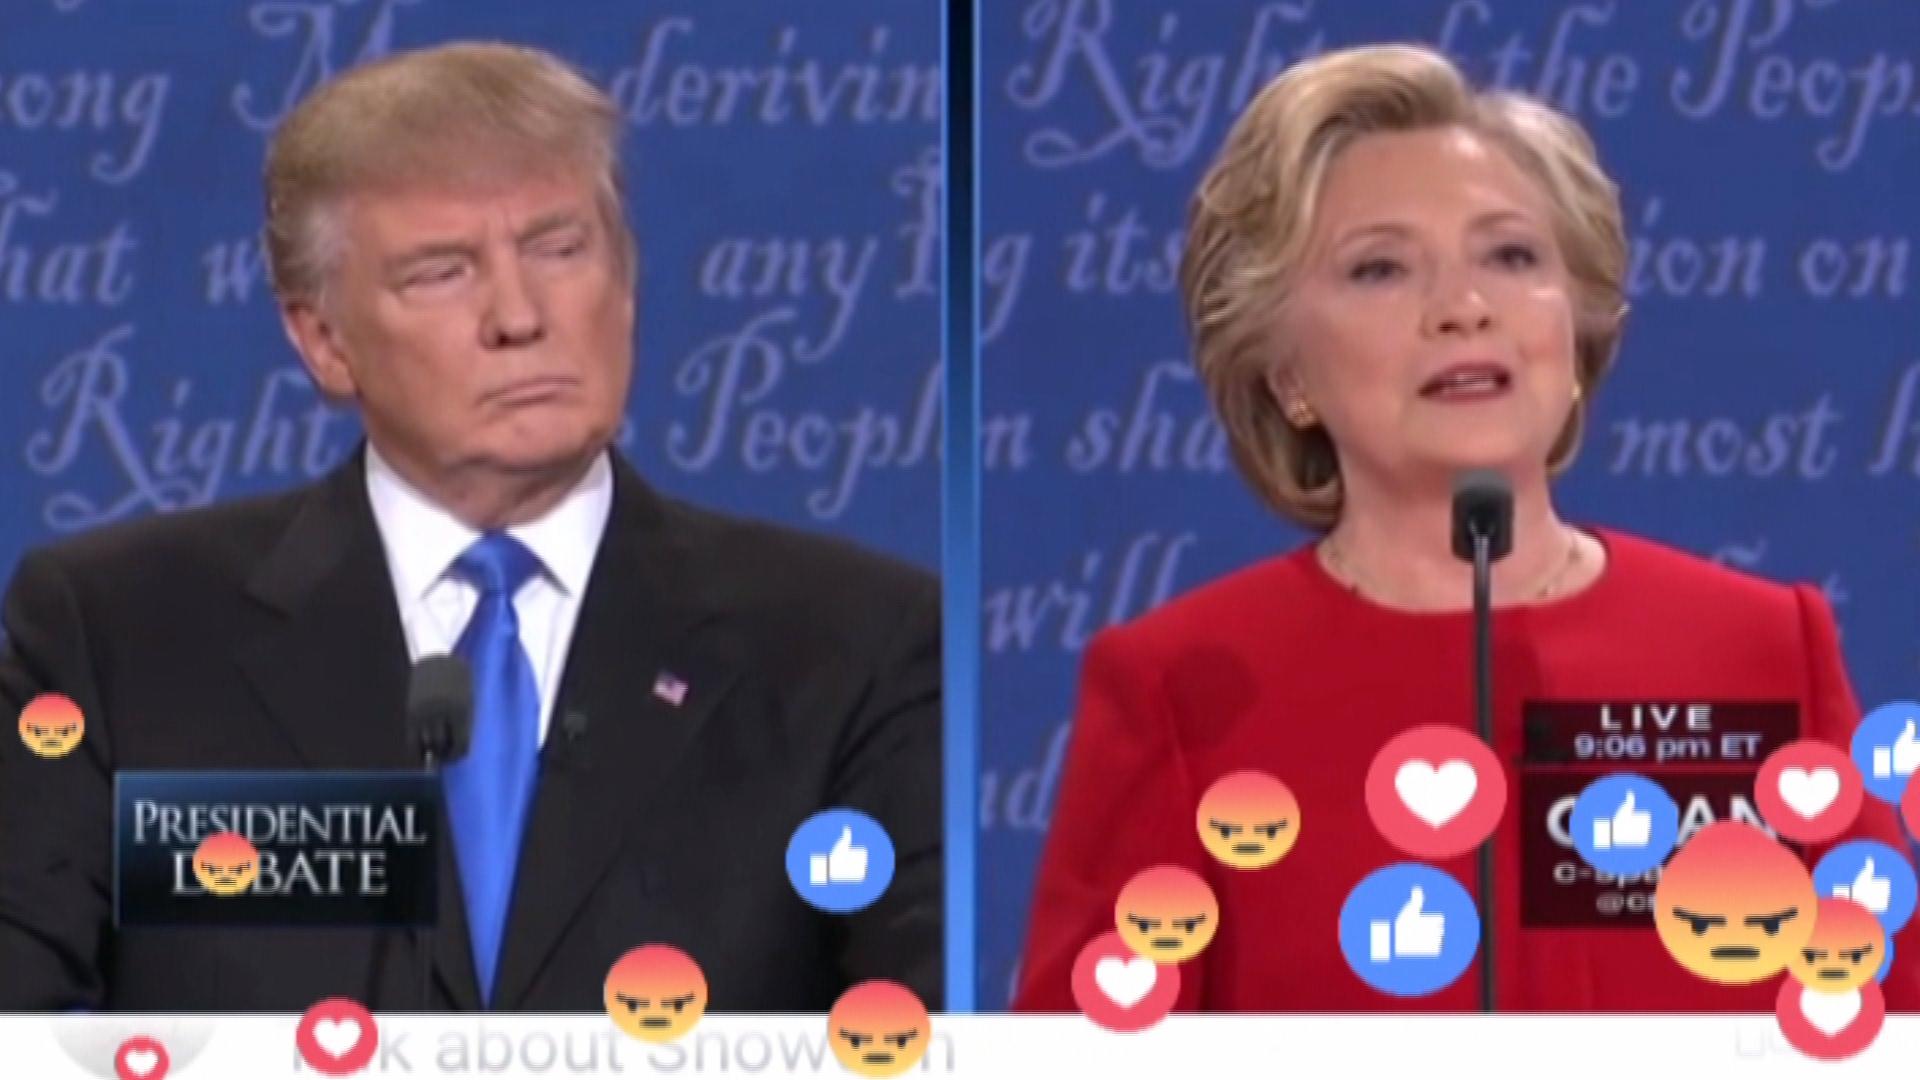 US-Wahlkampf: Clinton gegen Trump live auf Facebook